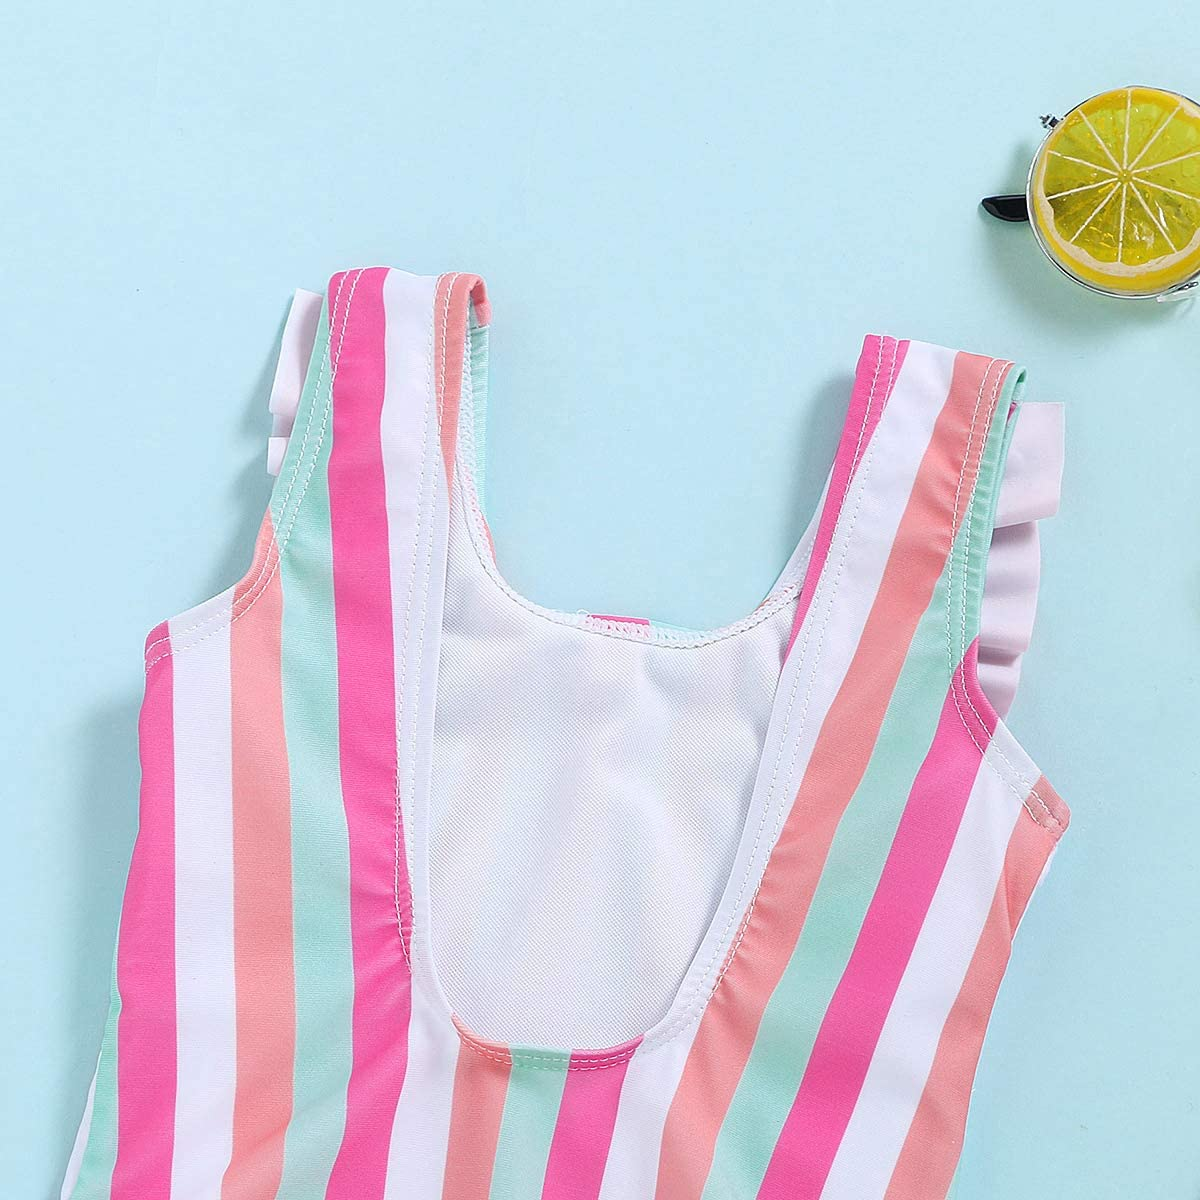 Happy Town One-Piece Infant Toddler Baby Girl Summer Swimsuit Watermelon Leopard Ruffle Swimwear Bikini Bathing Suit